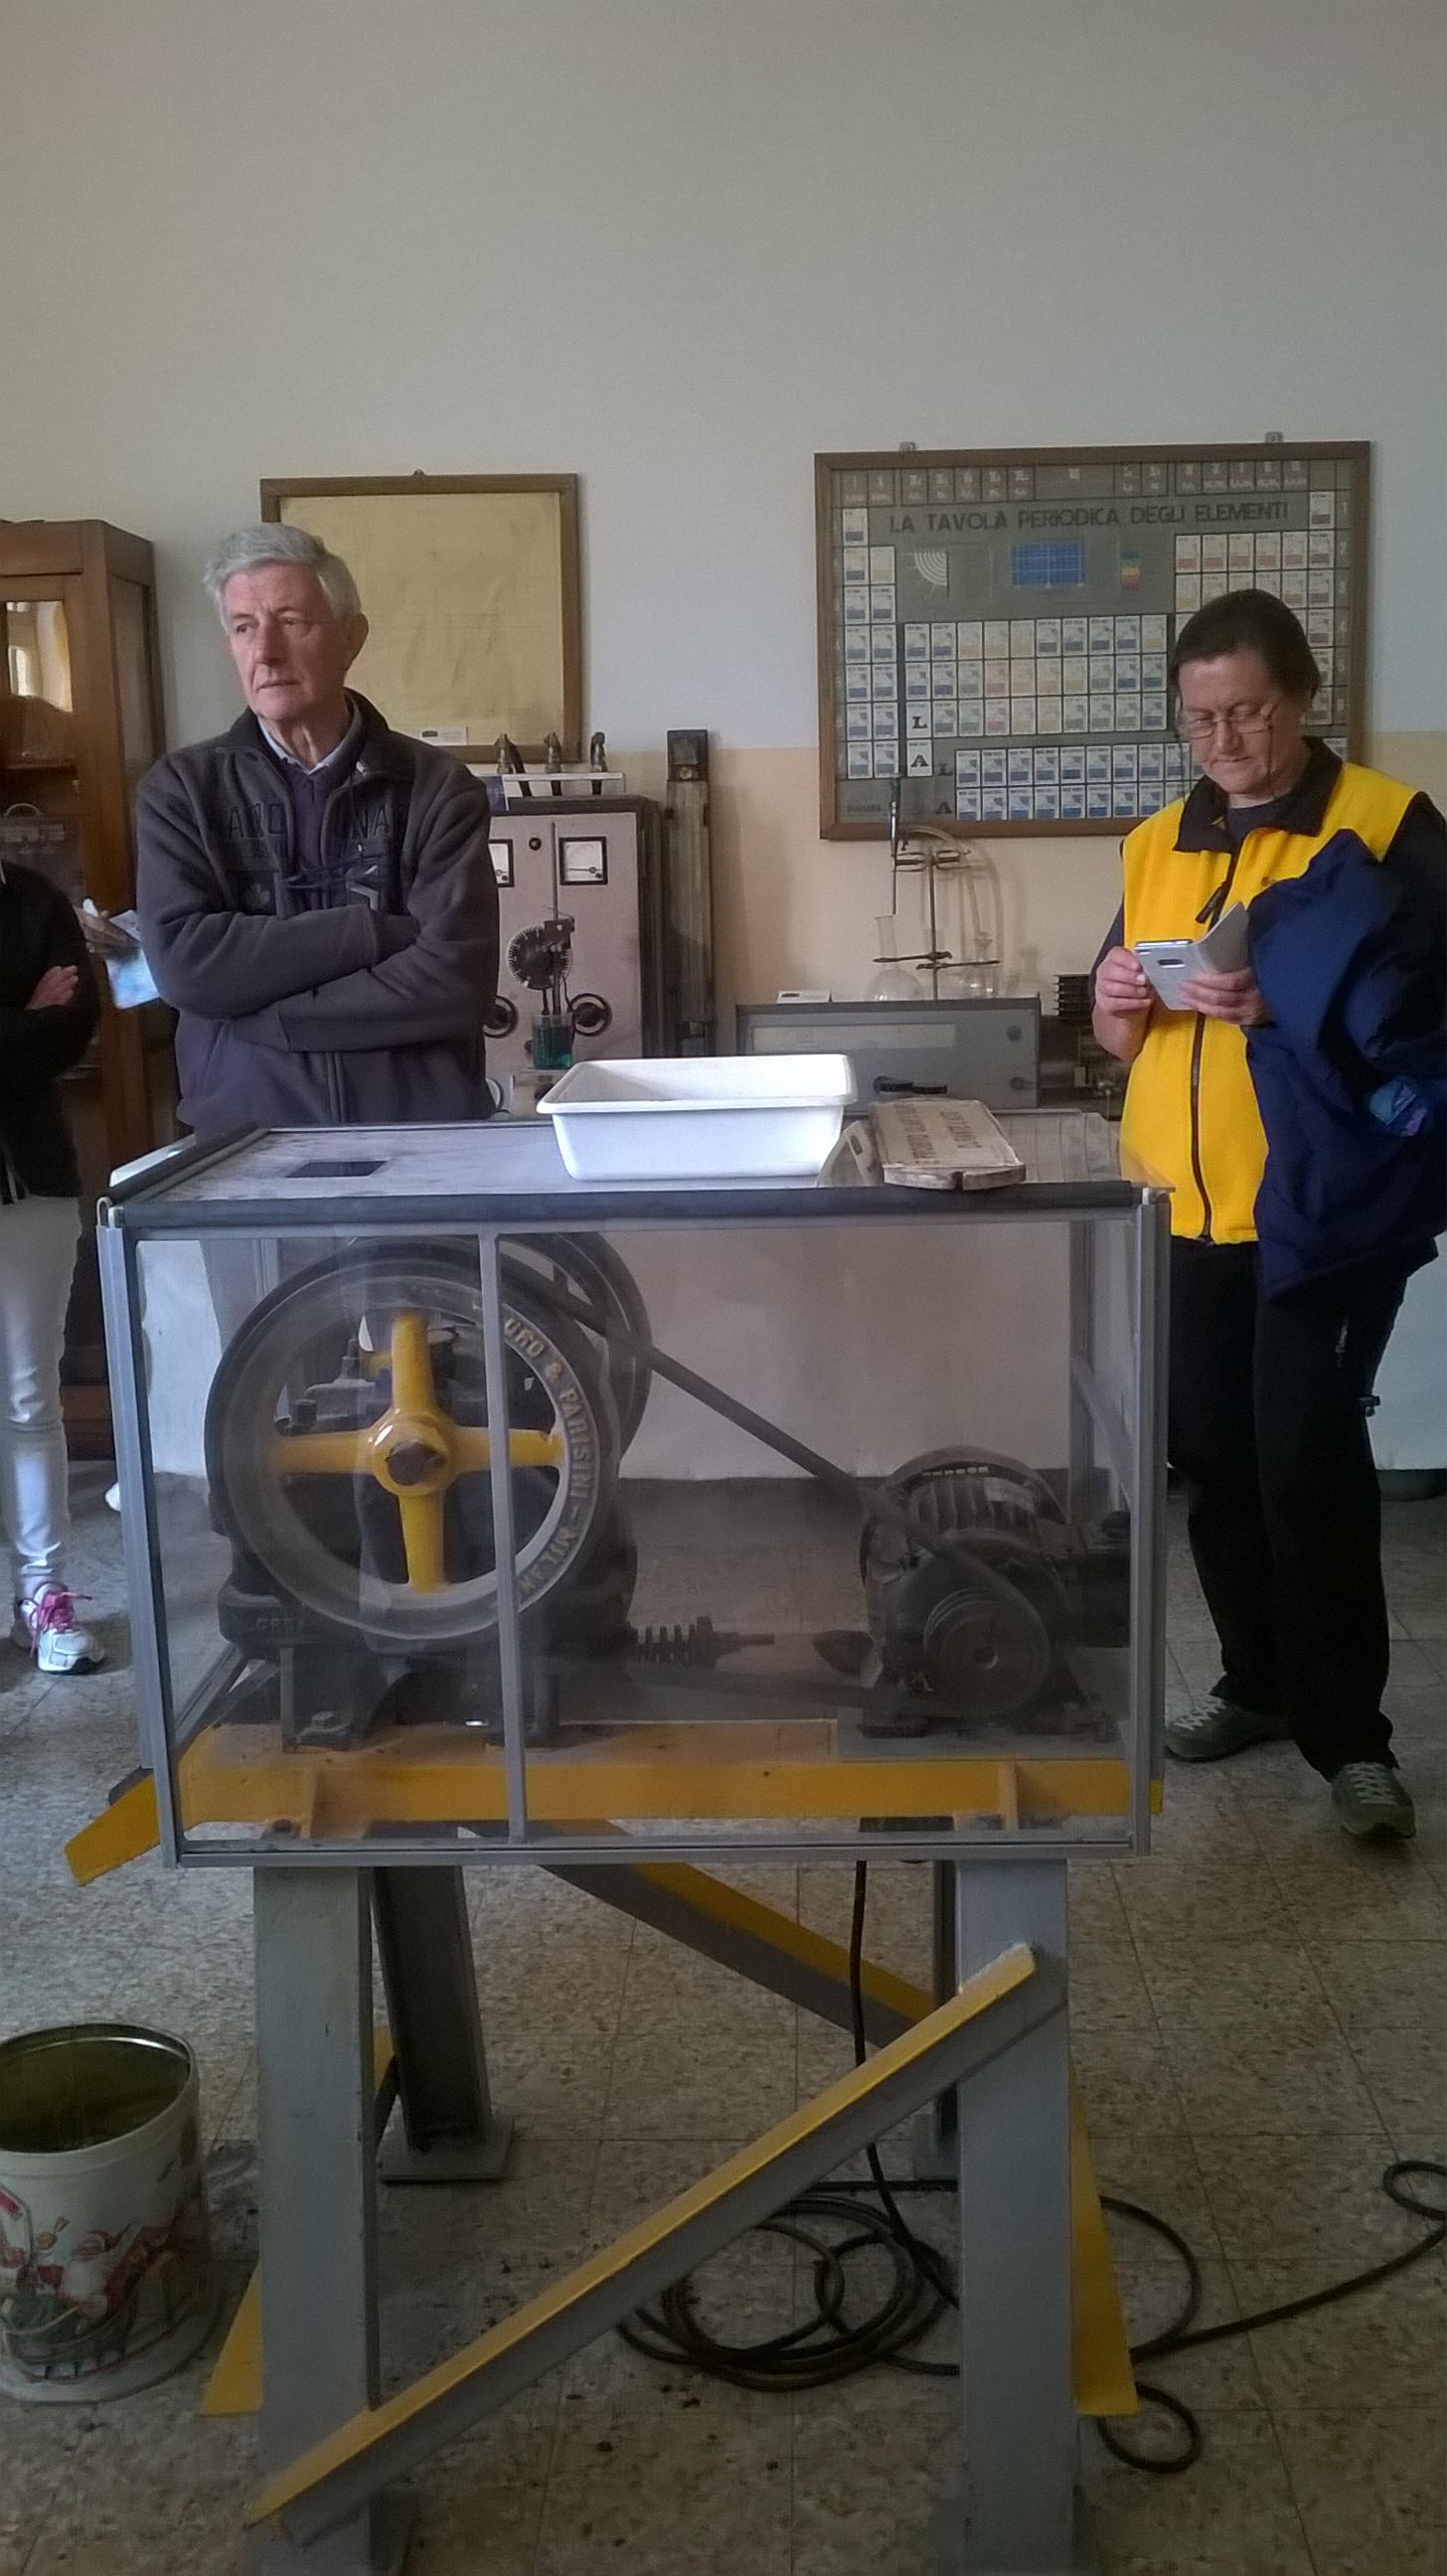 43_ITM 2016 Gorno_visita museo